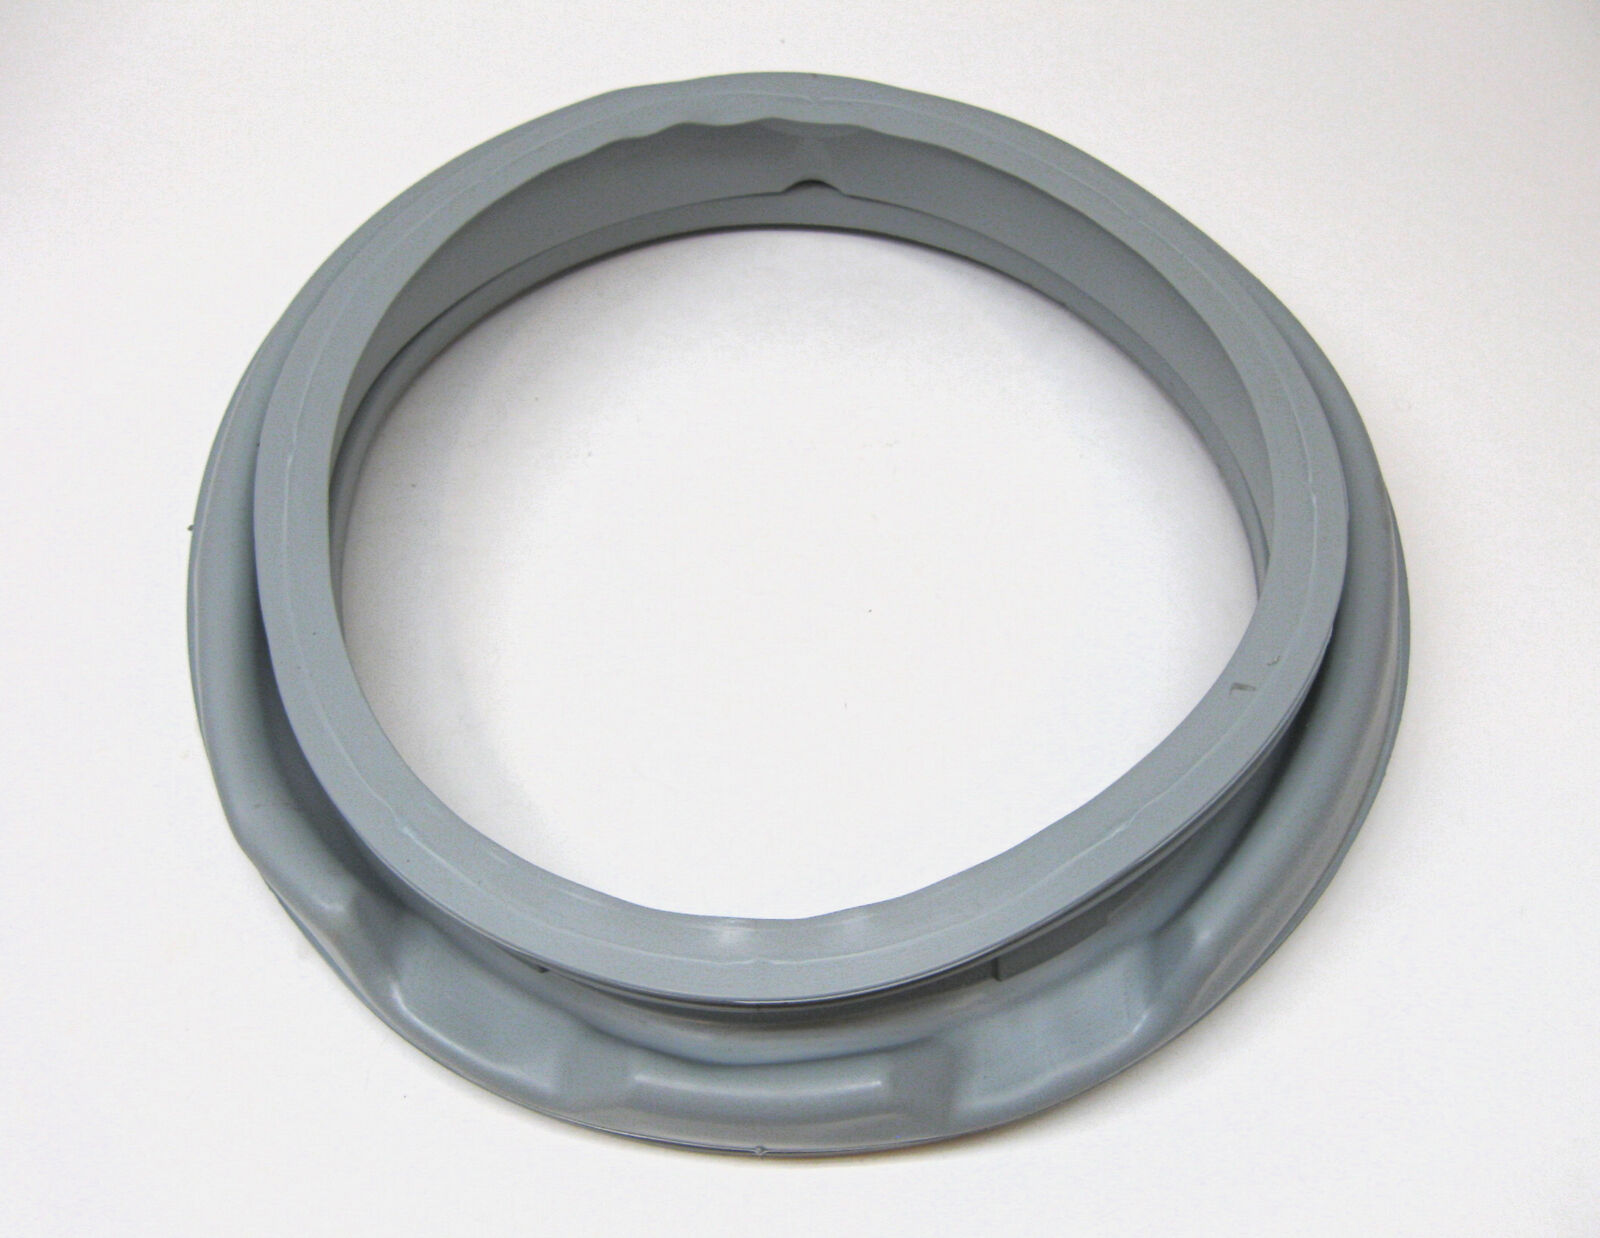 Washing Machine Door Diaphram Boot Gasket Seal for Samsung DC64-00563B